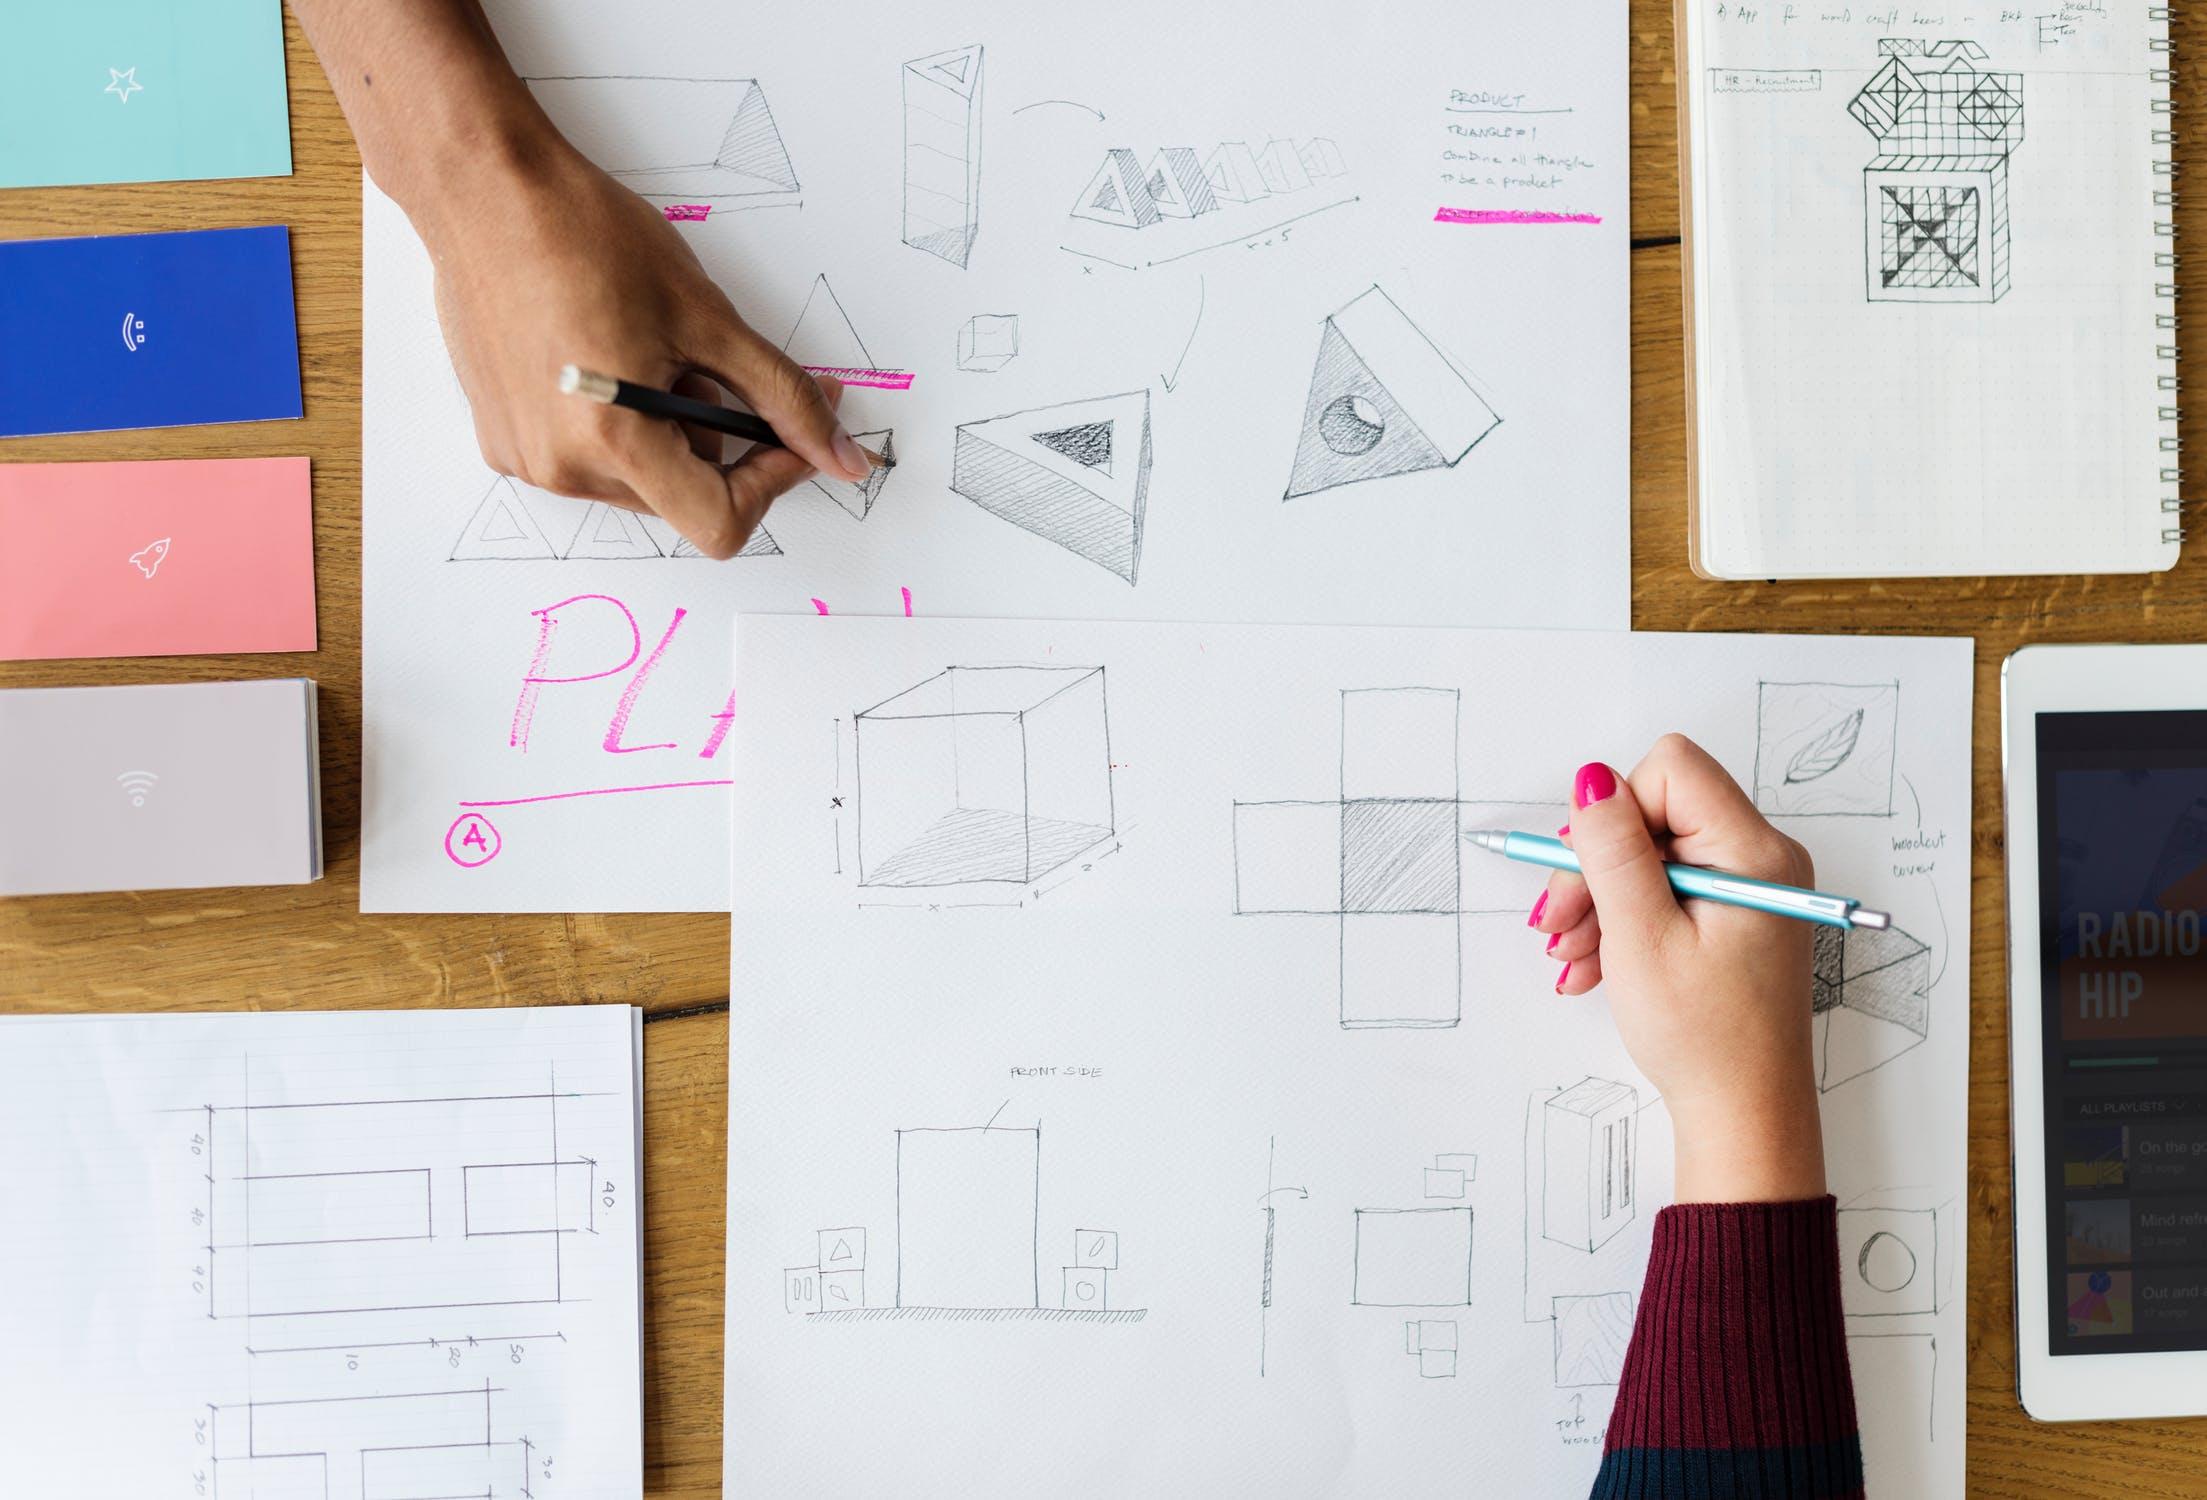 creative-brainstorm-feat